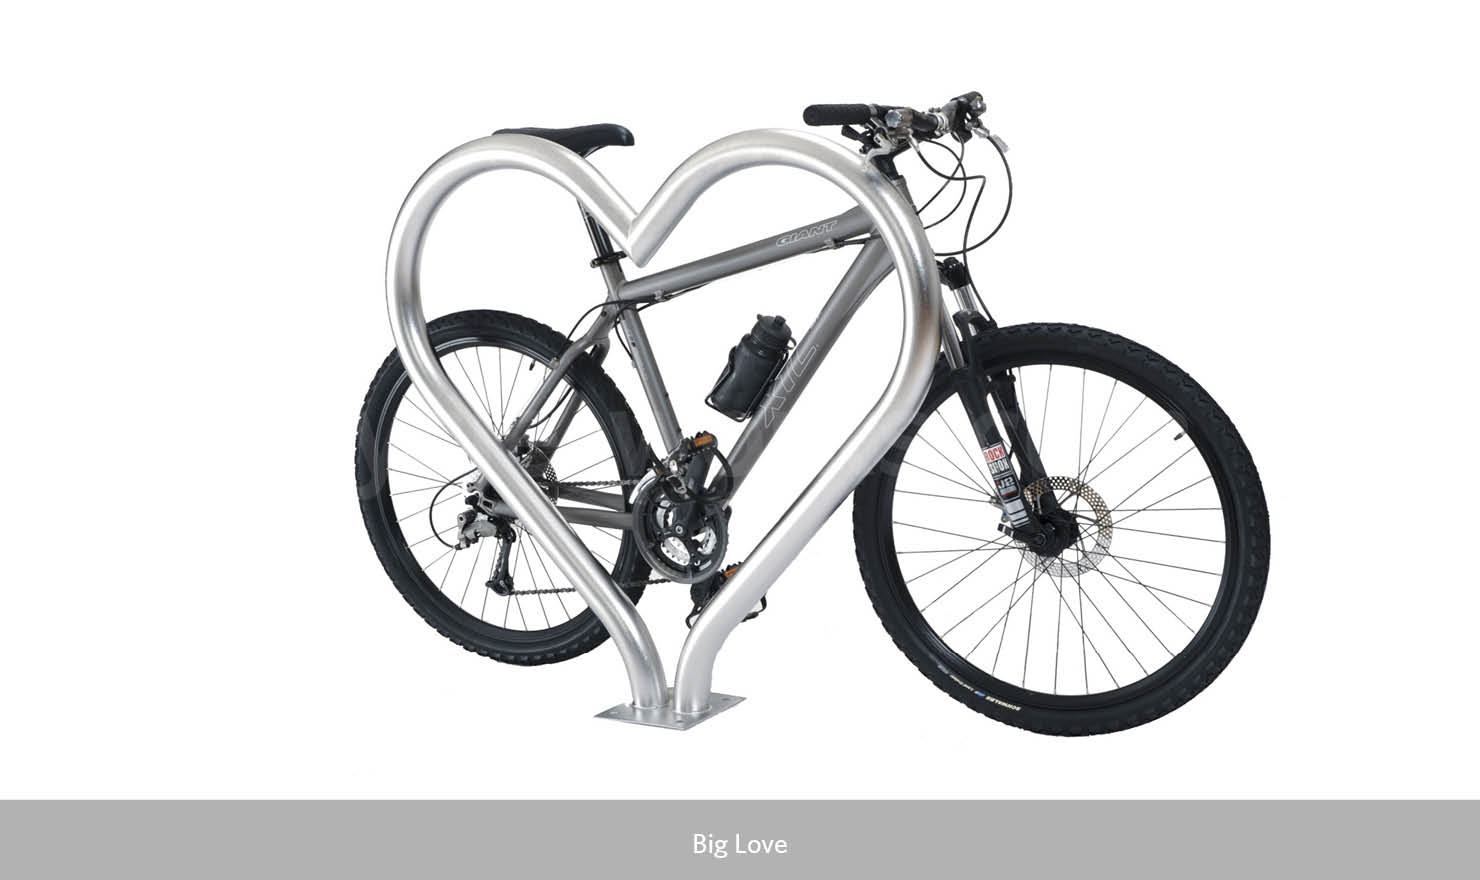 Big Love Bike Rack